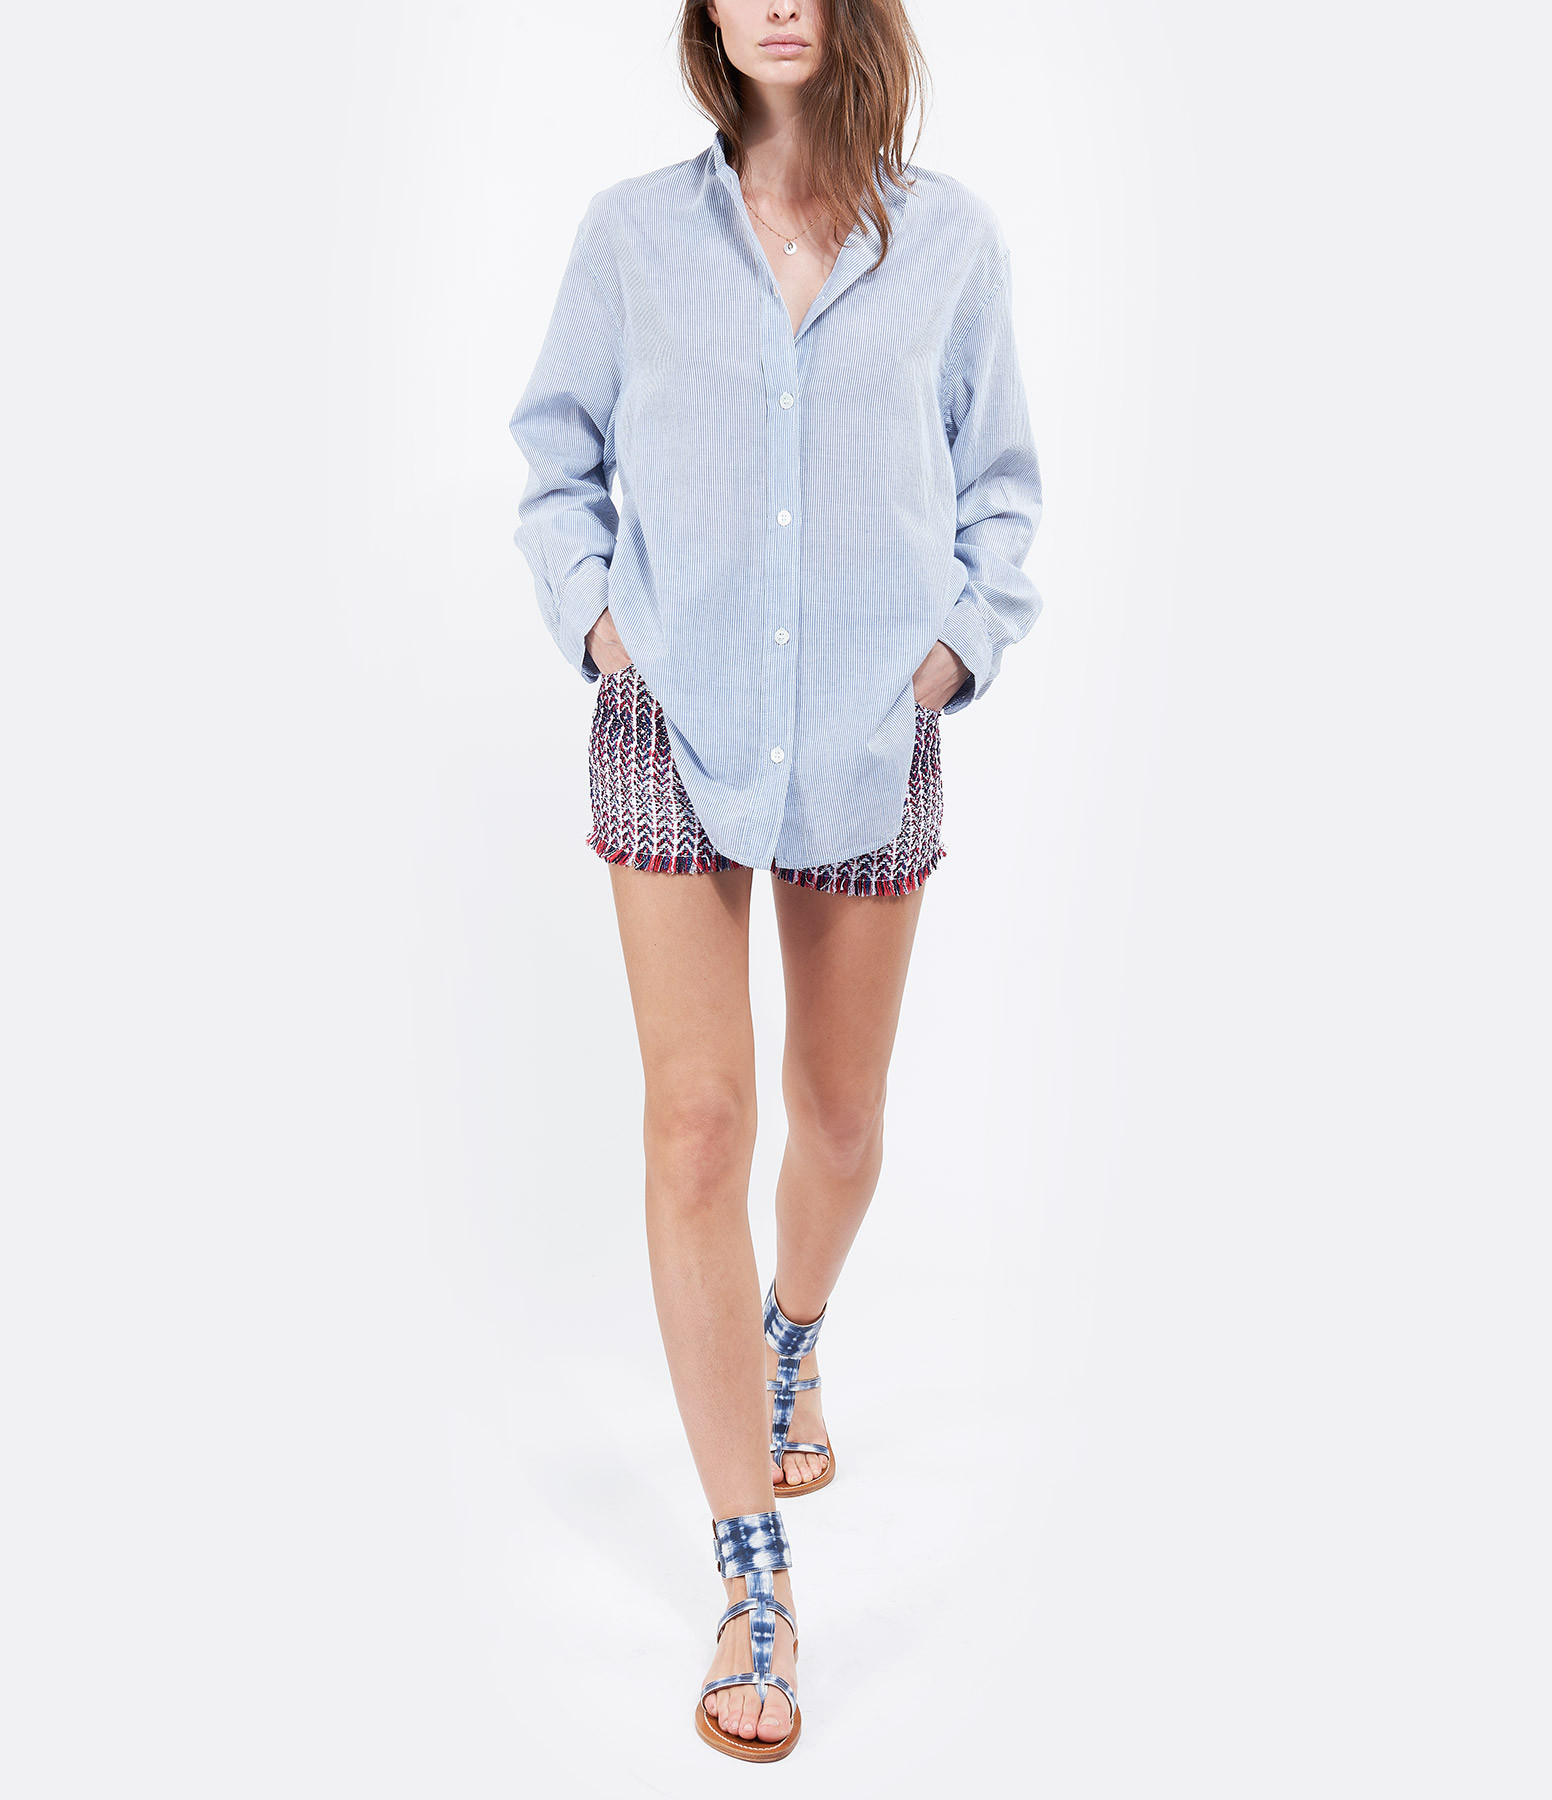 VANESSA BRUNO - Chemise Lidiane Coton Bleu